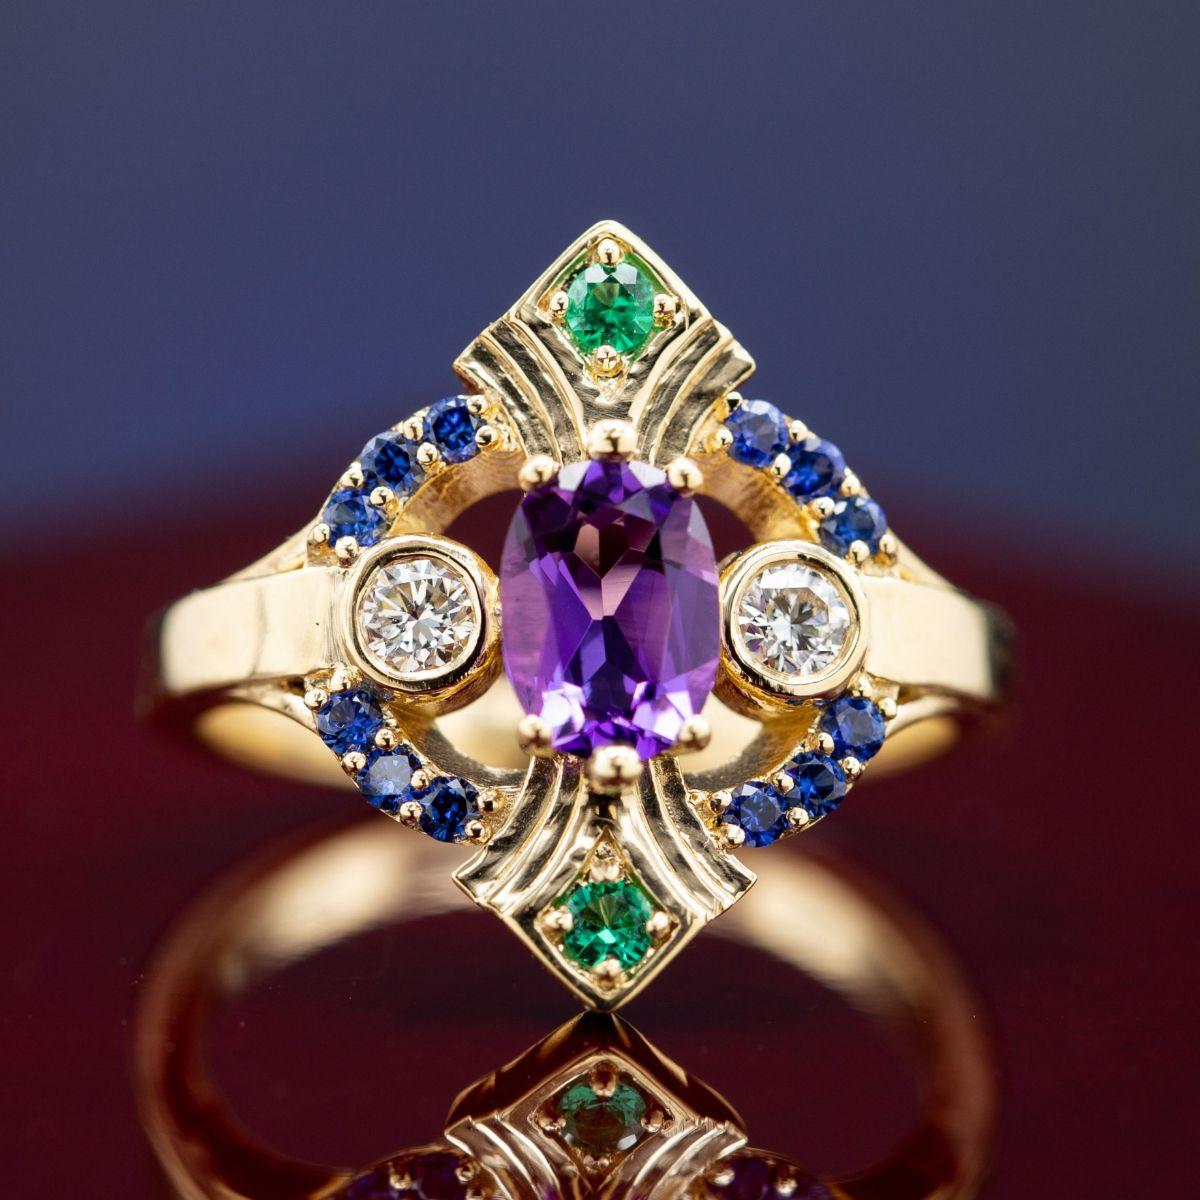 art deco bold colors - vintage engagement rings